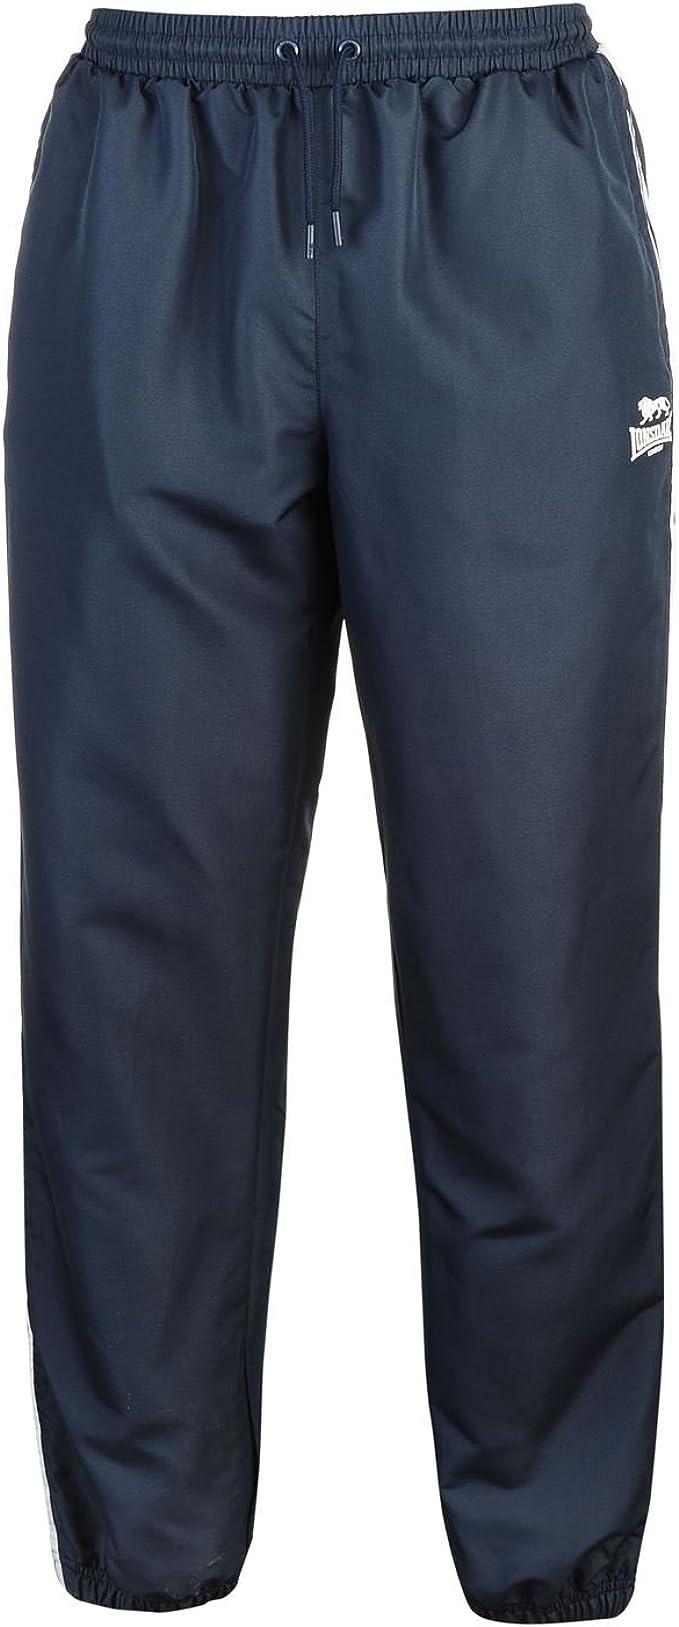 Lonsdale Hombre 2 Stripe Pantalones Deportivos De Chándal ...